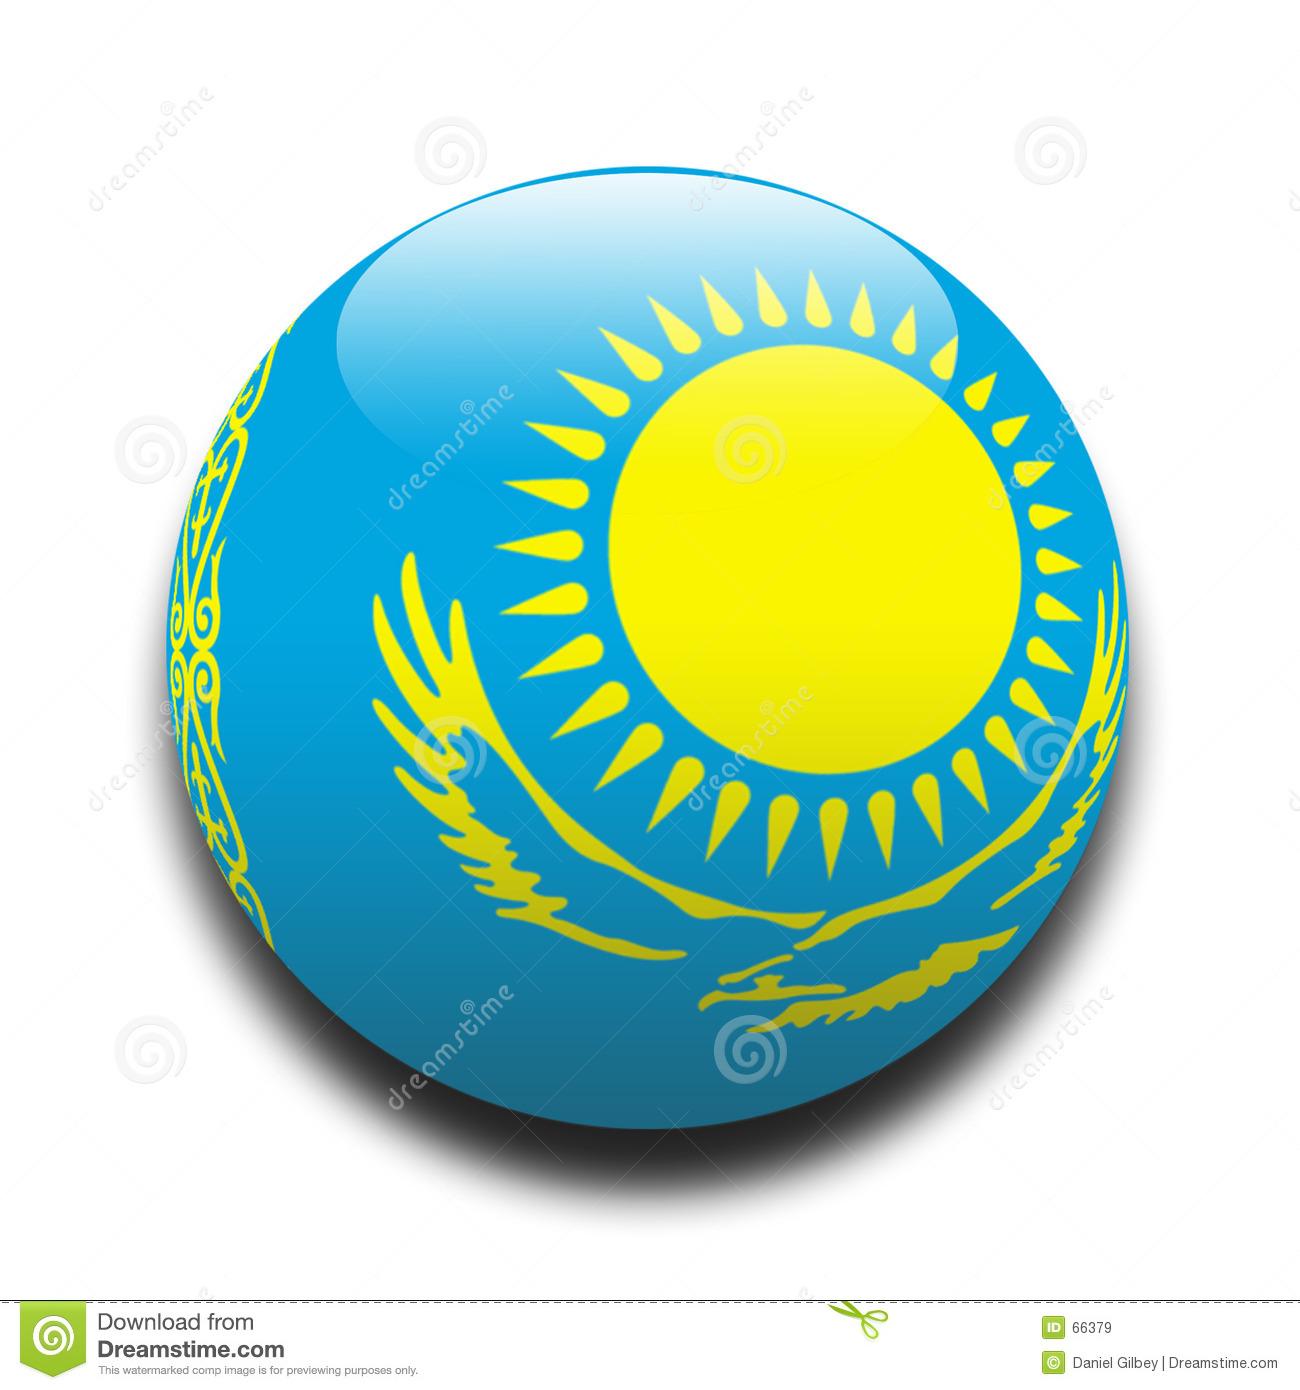 Kazakhstan clipart #12, Download drawings